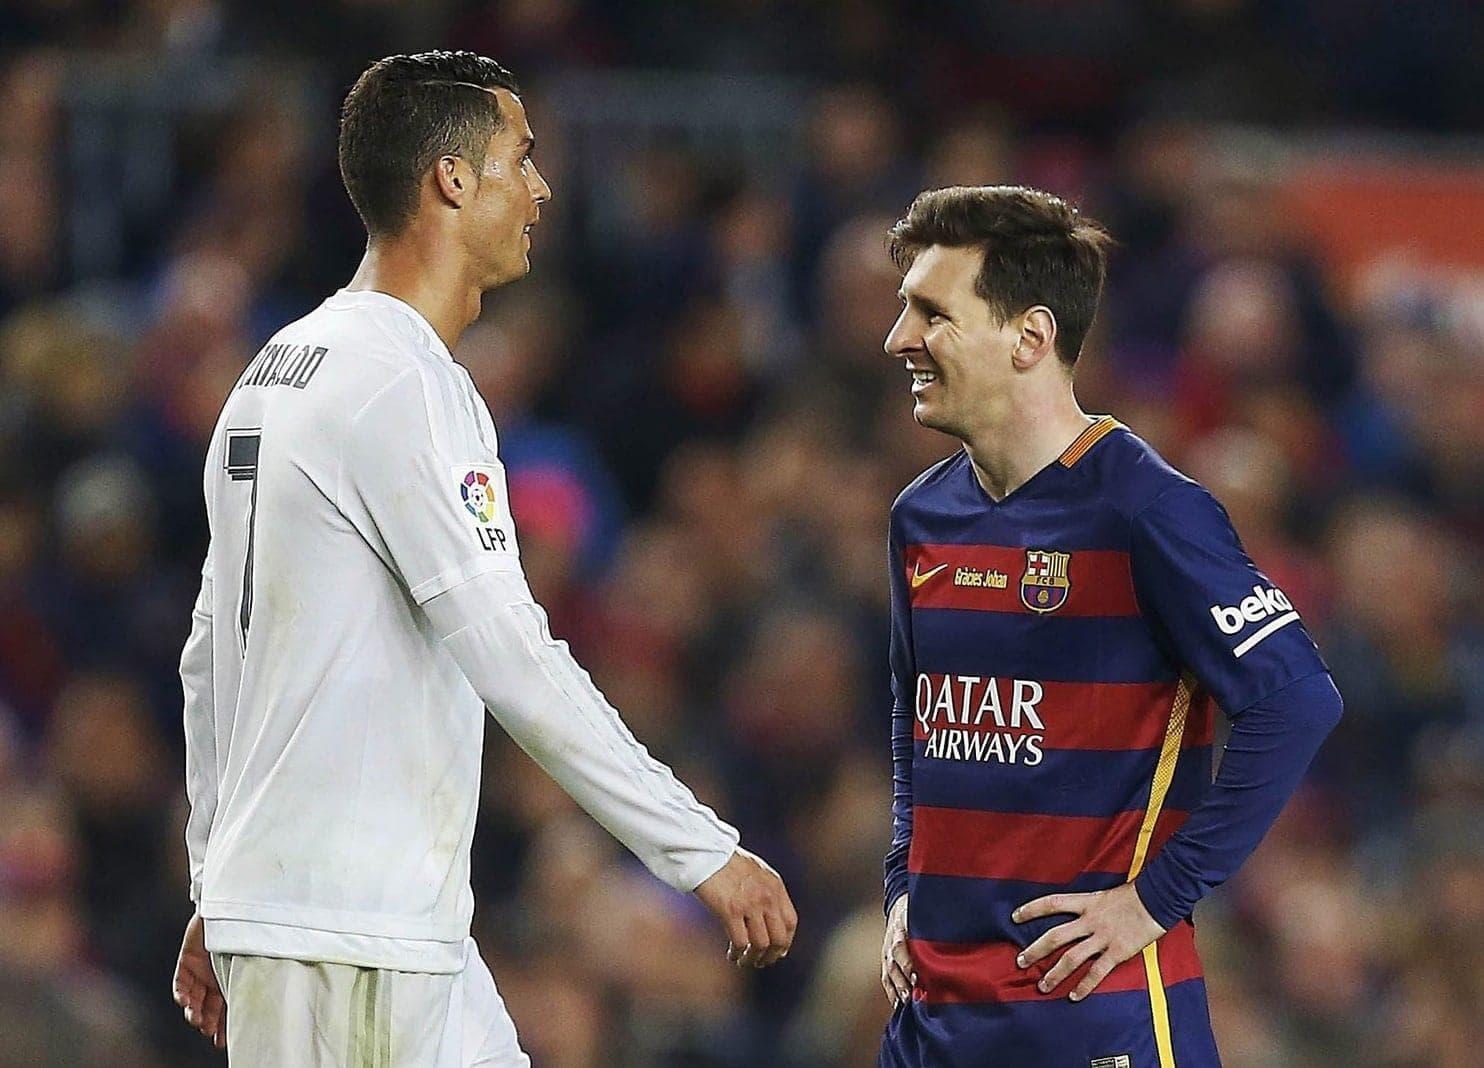 Wohin Wechselt Ronaldo